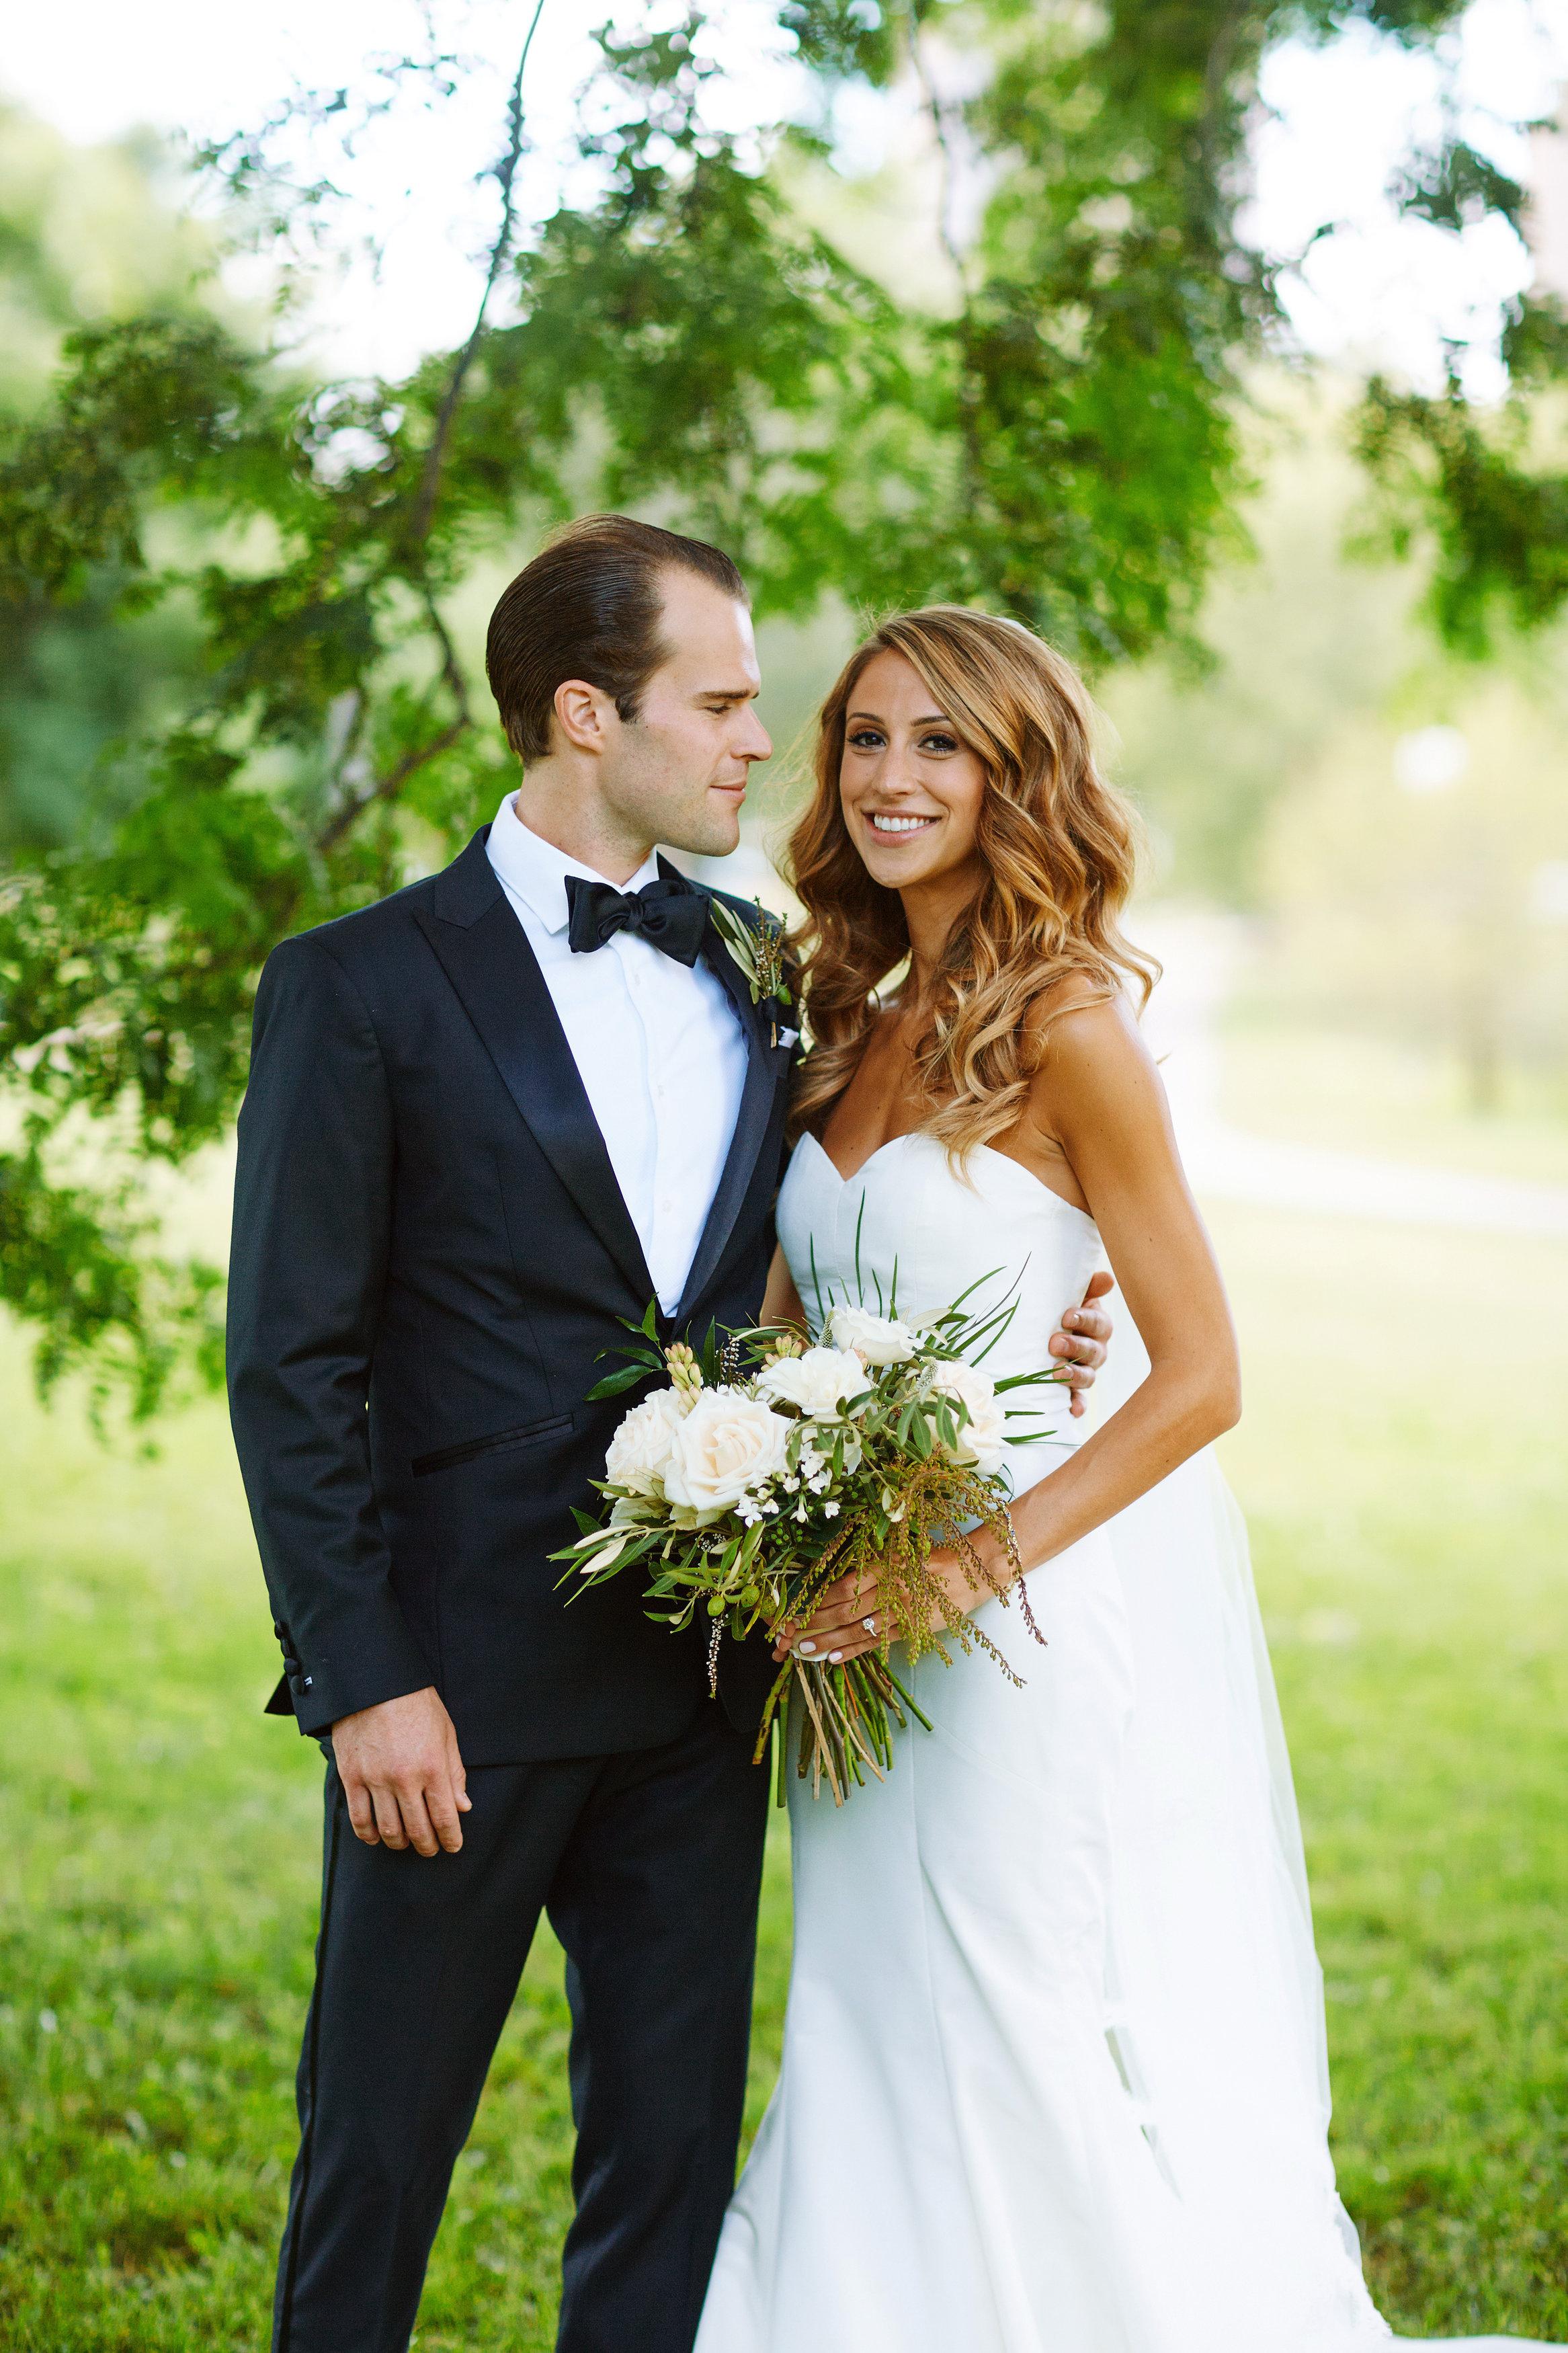 Wedding_Aschauer_129.jpg